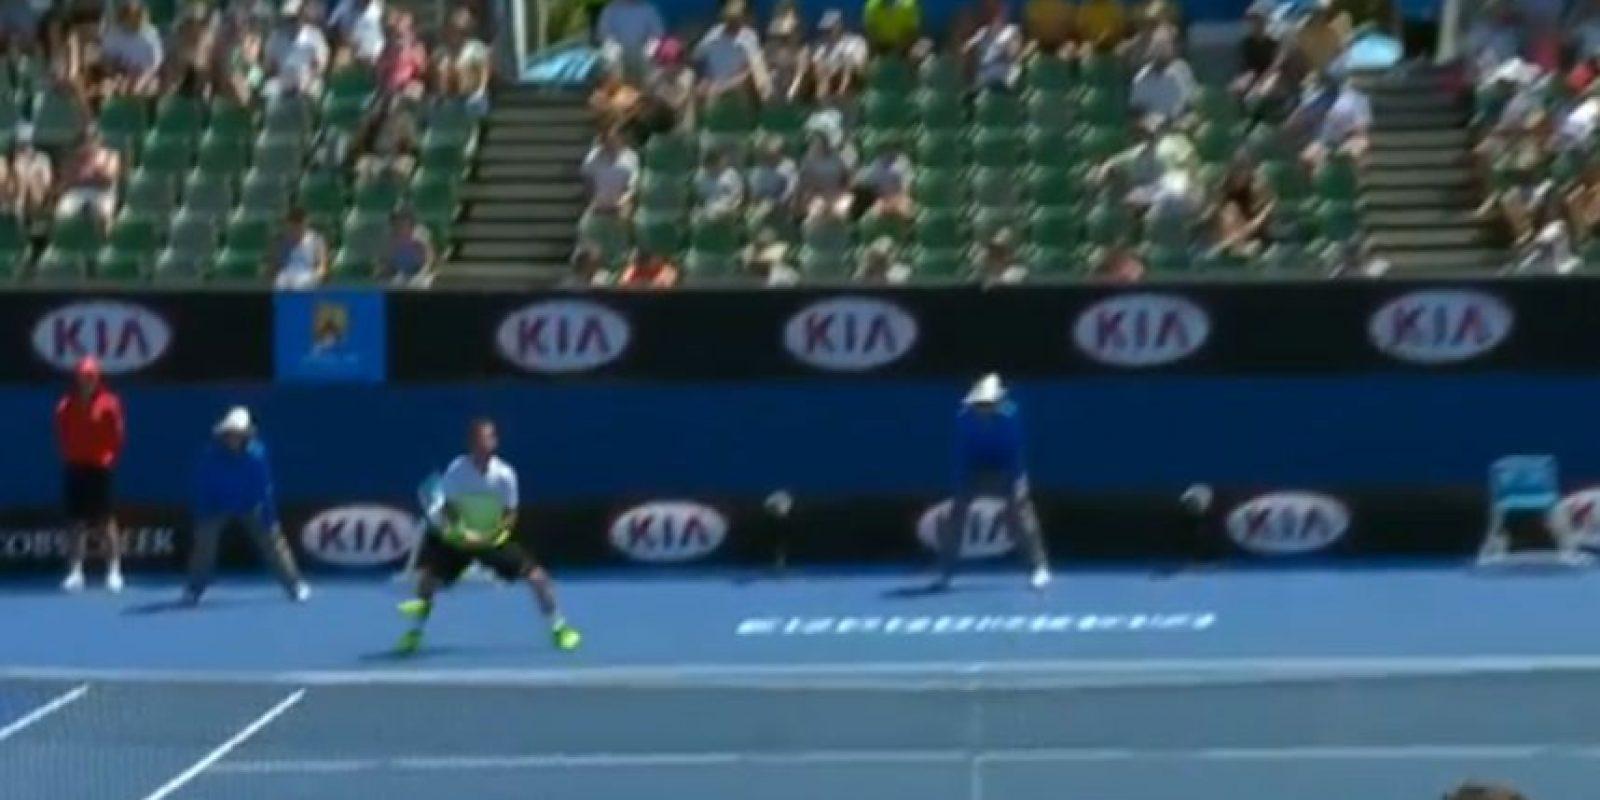 La pelota pegó en el recogebolas Foto:Youtube: Australian Open TV